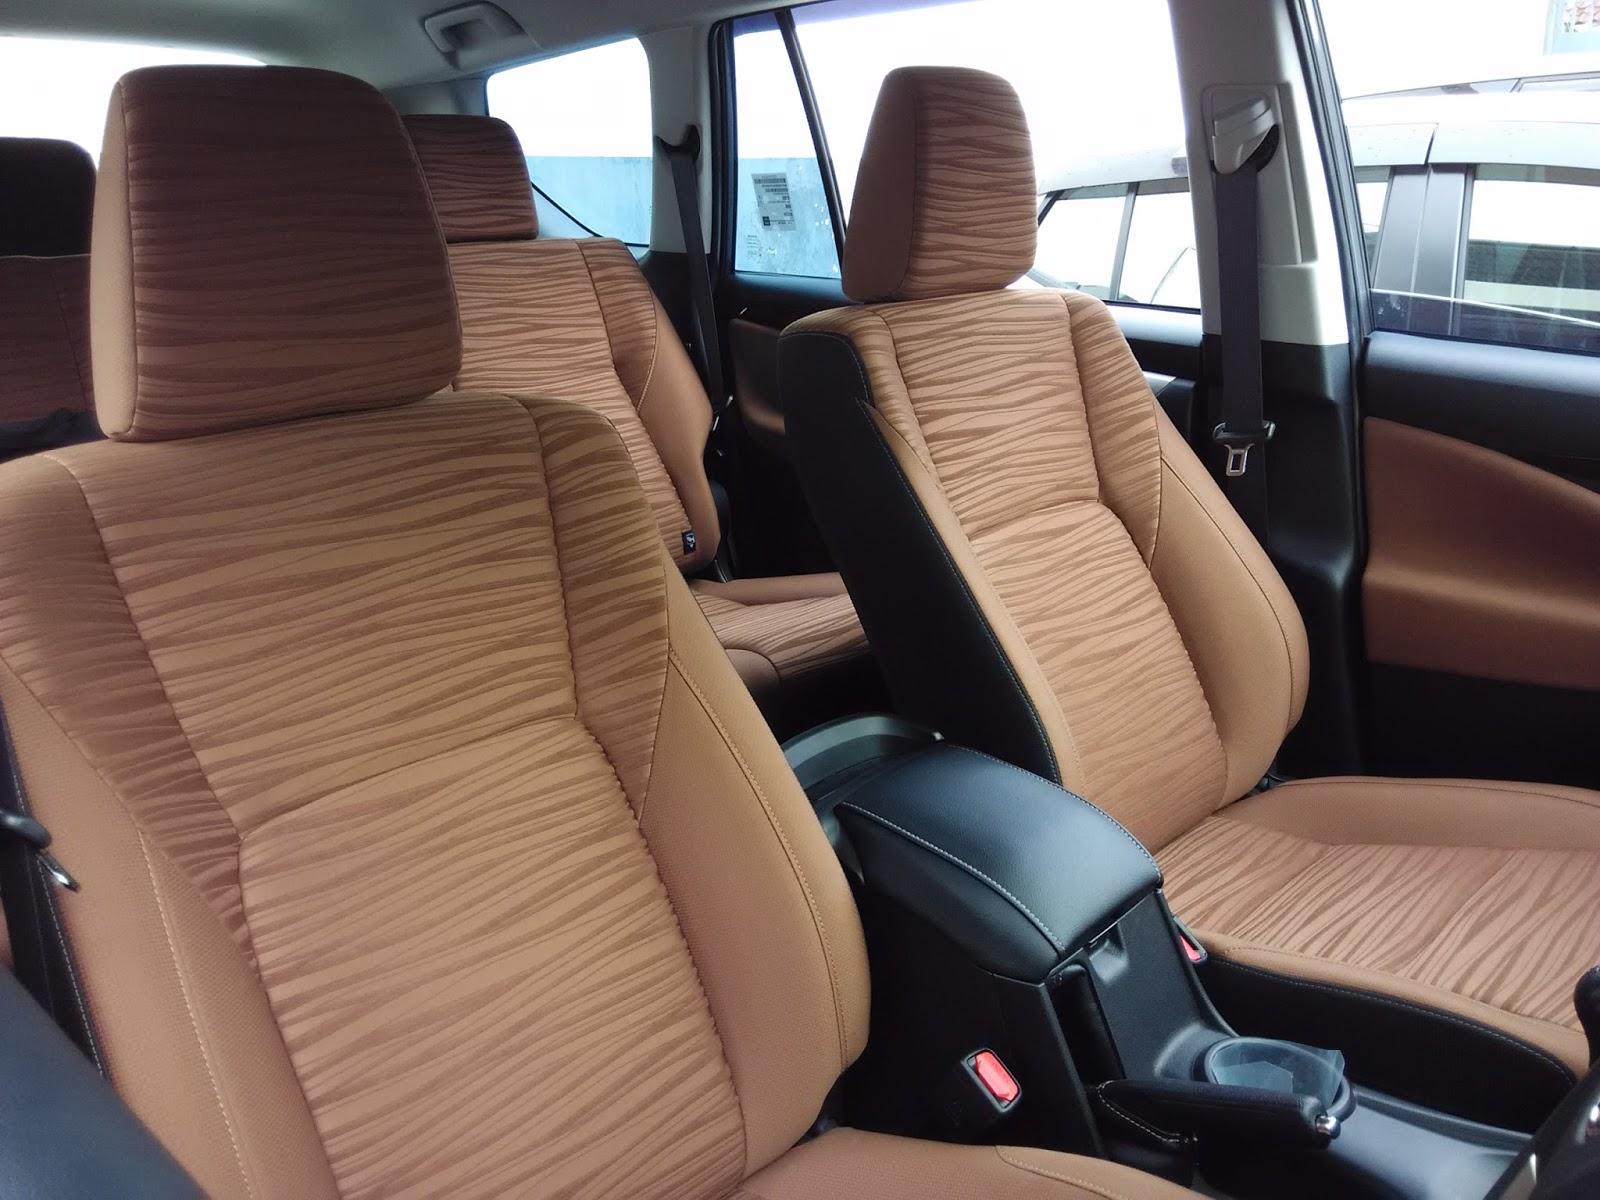 All New Kijang Innova Reborn Spesifikasi Grand Avanza 2016 Mobil Keluarga Terbaru Toyota